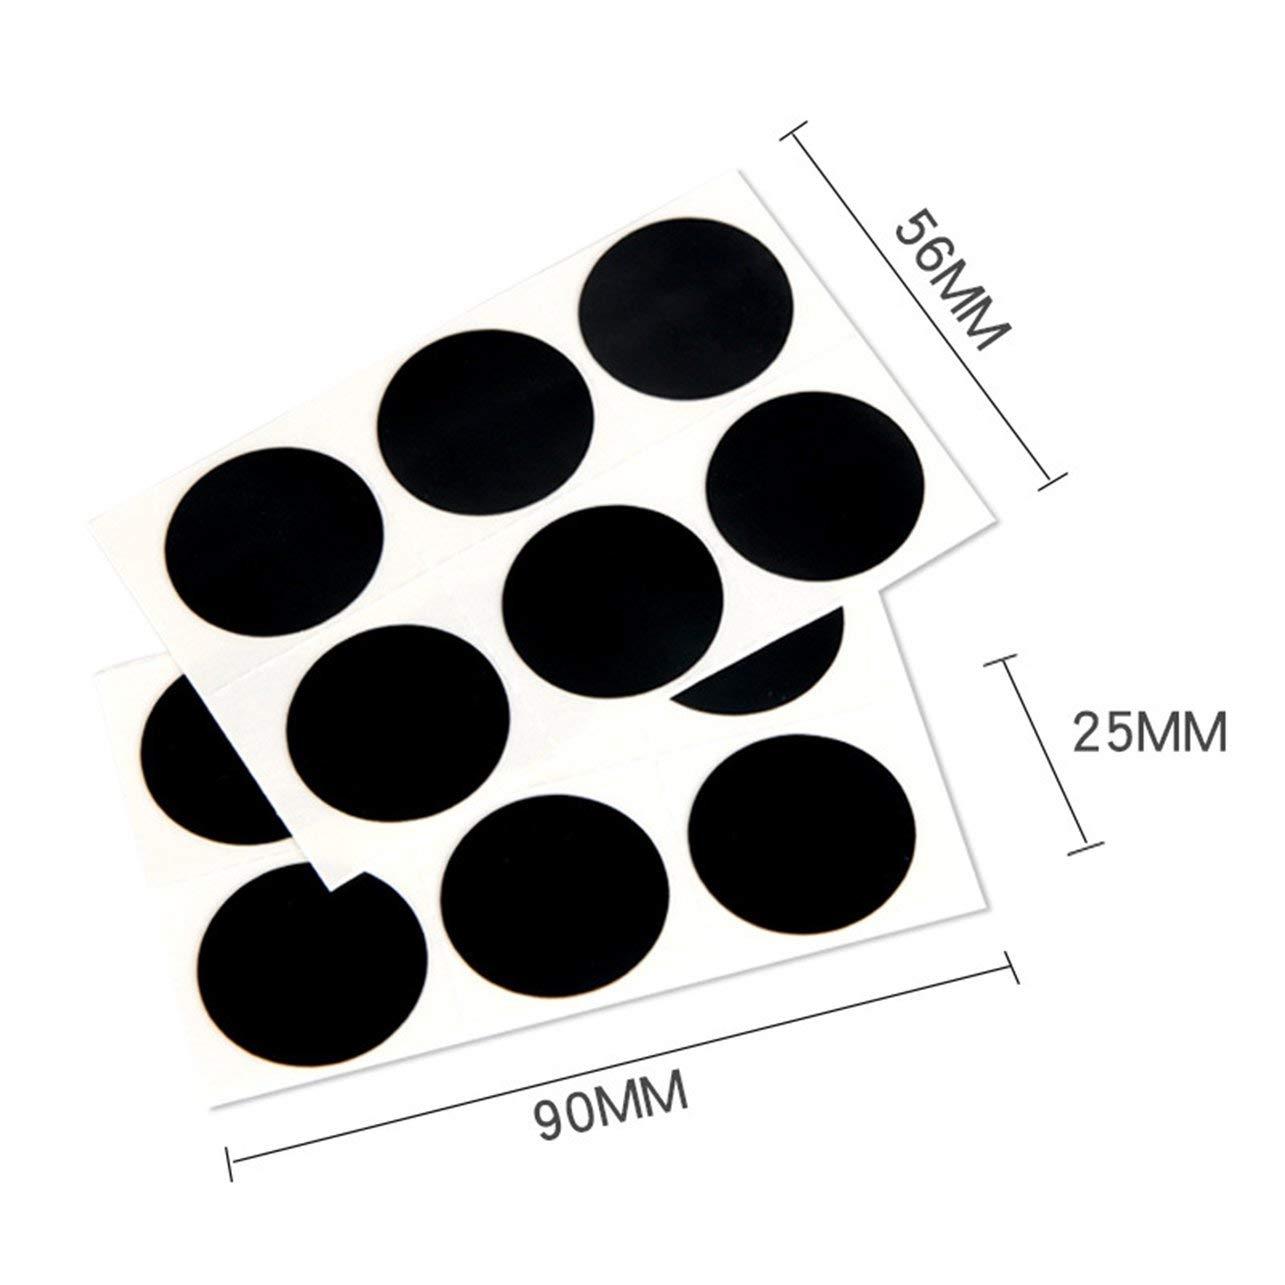 WOSOSYEYO Nouveau No Glue Needed V/élo V/élo Pneu Crevaison Outil De R/éparation Kit Sticker-Patch